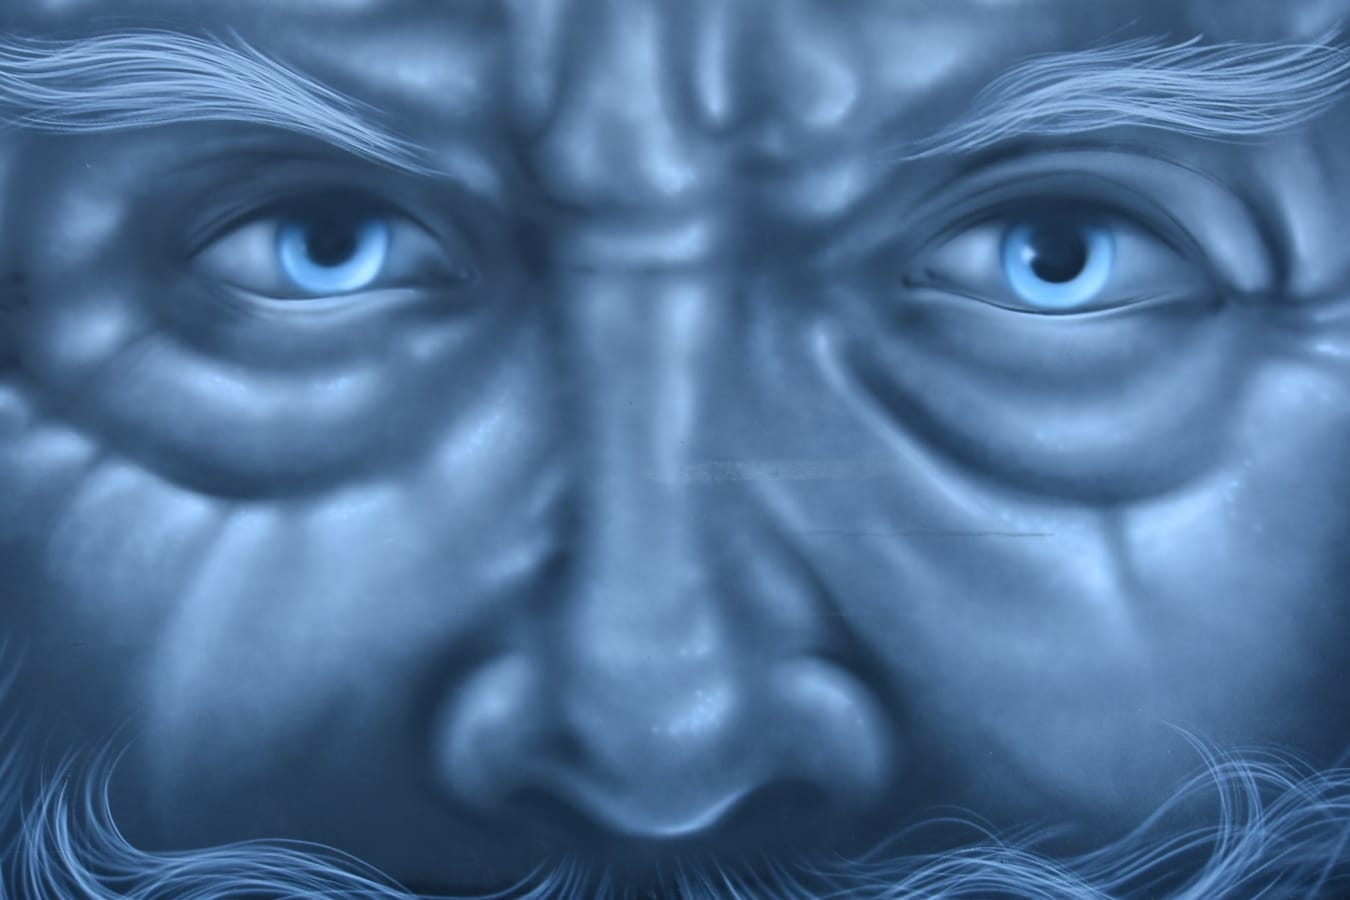 old man, face, graffiti, portrait, close-up, blue, eyes, art, eye, abstract